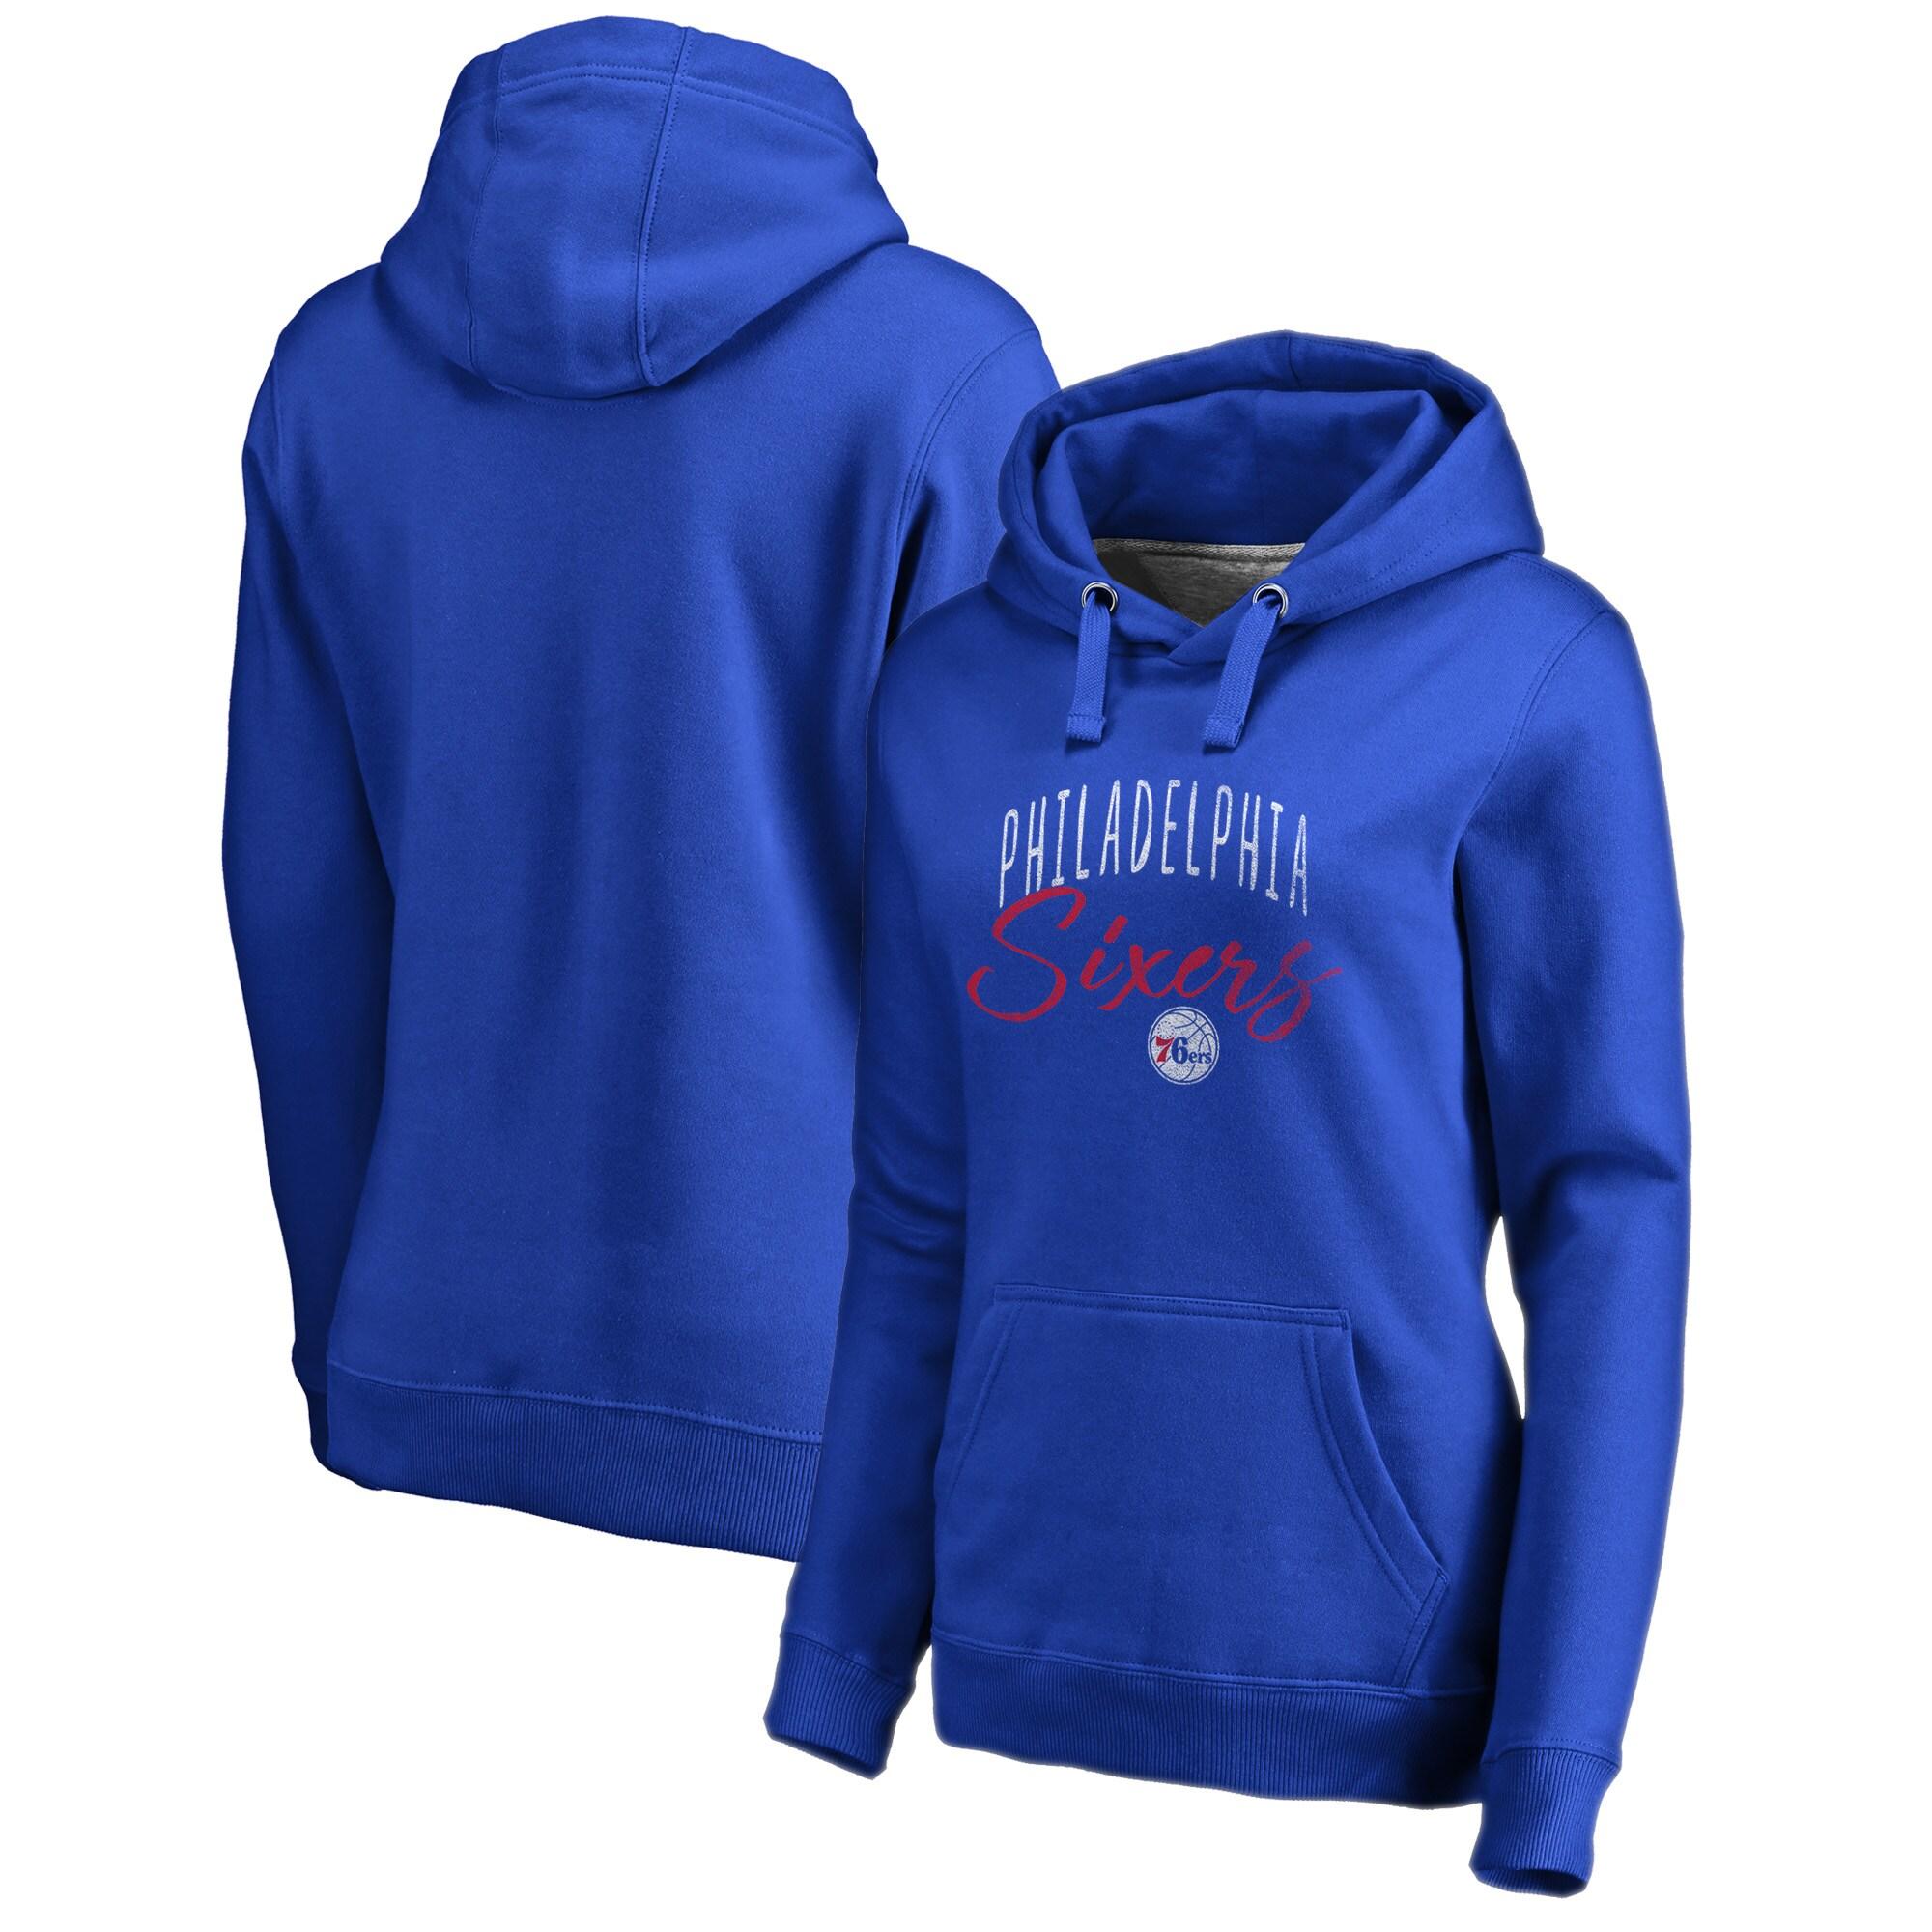 Philadelphia 76ers Fanatics Branded Women's Graceful Plus Size Pullover Hoodie - Royal